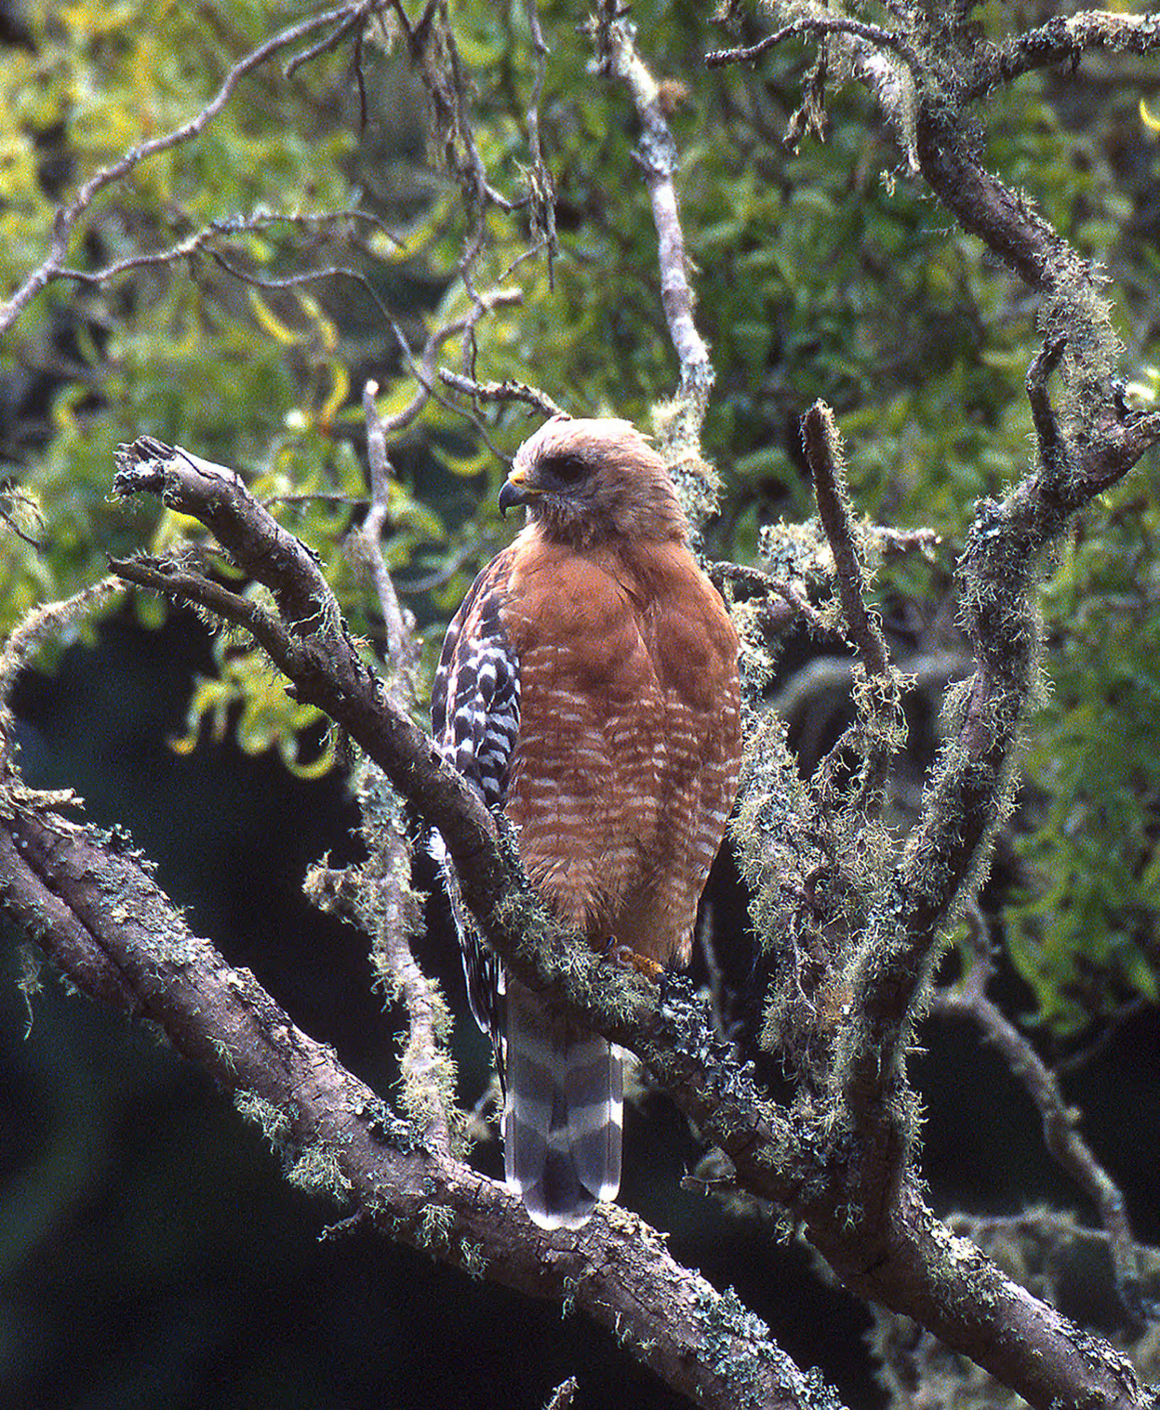 Redshouldered_Hawk-LeeKarney